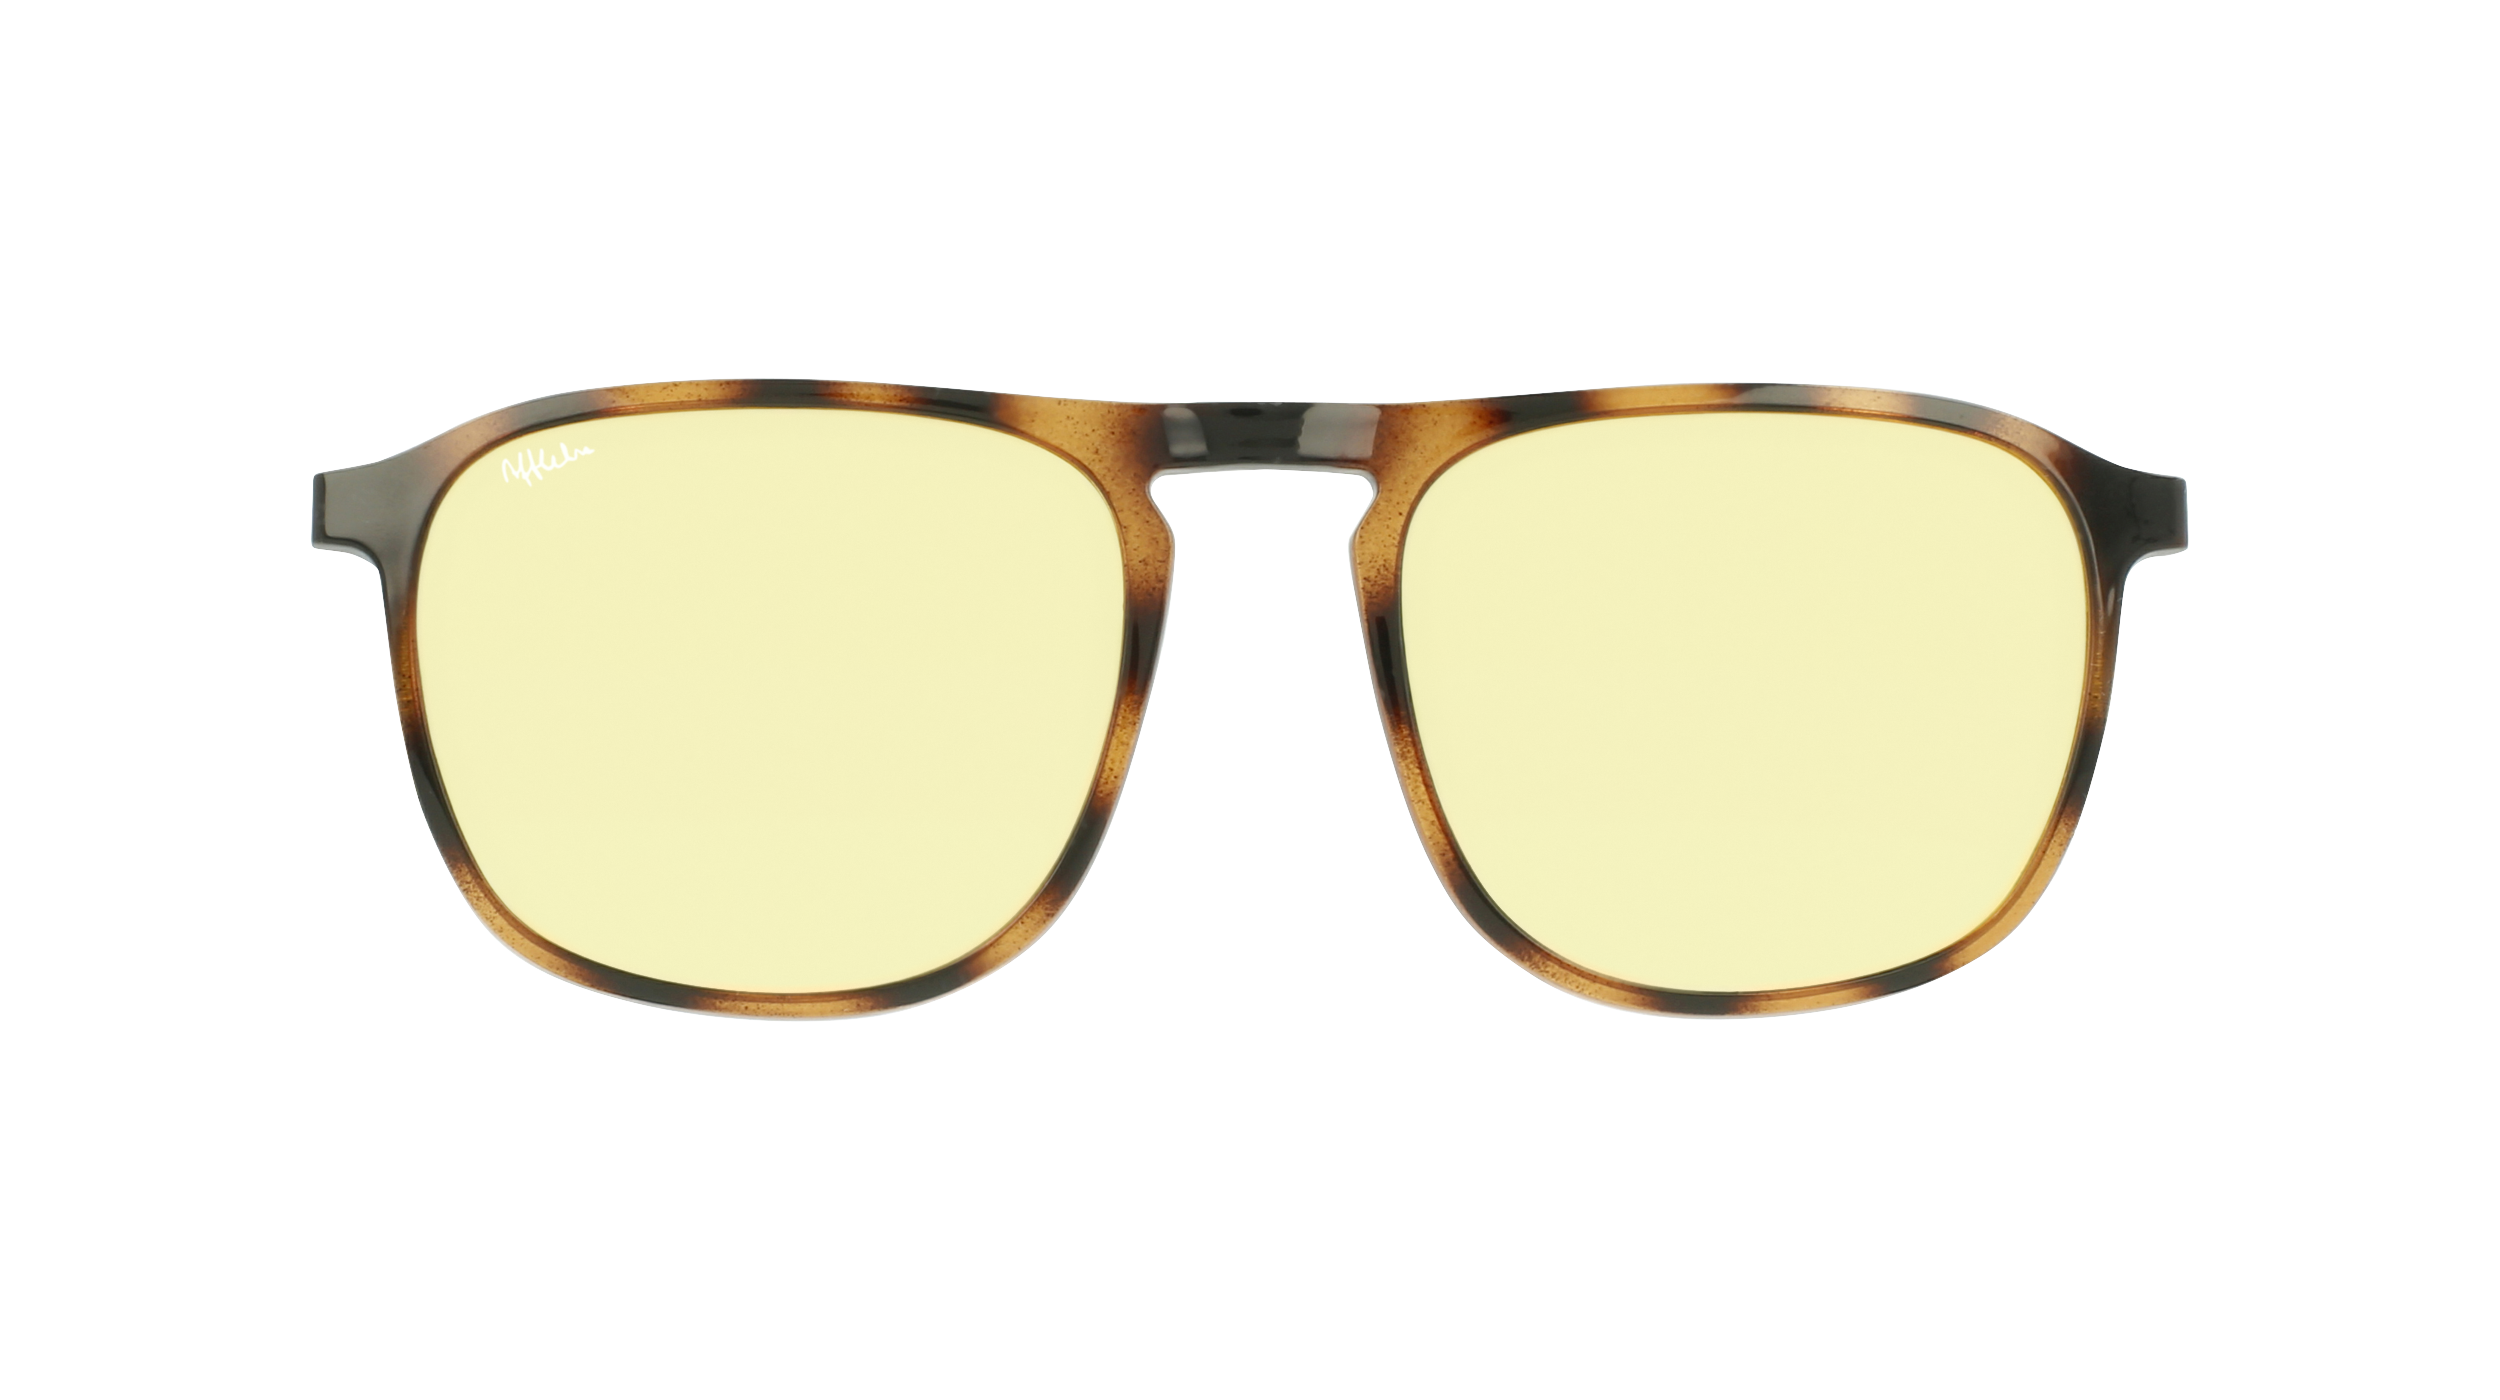 afflelou/france/products/smart_clip/clips_glasses/07630036457269.png